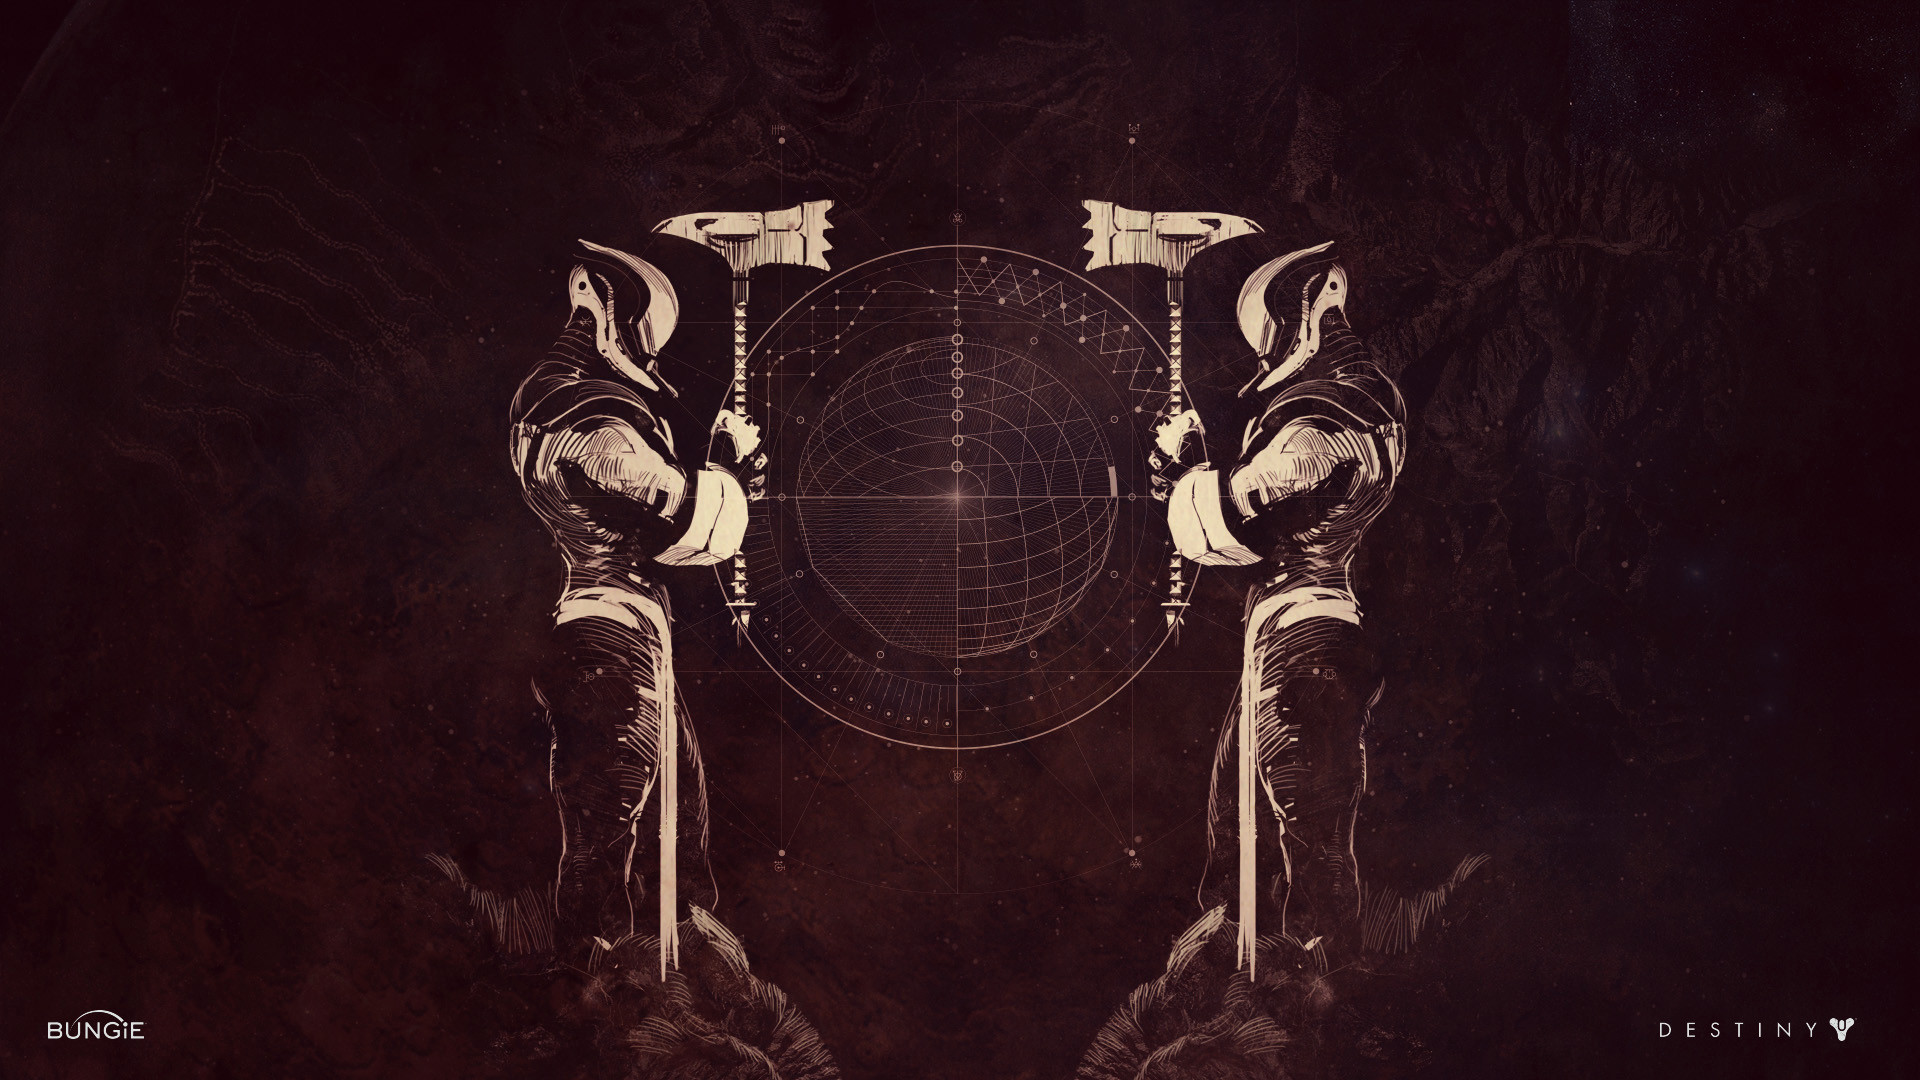 The Taken King - Destiny